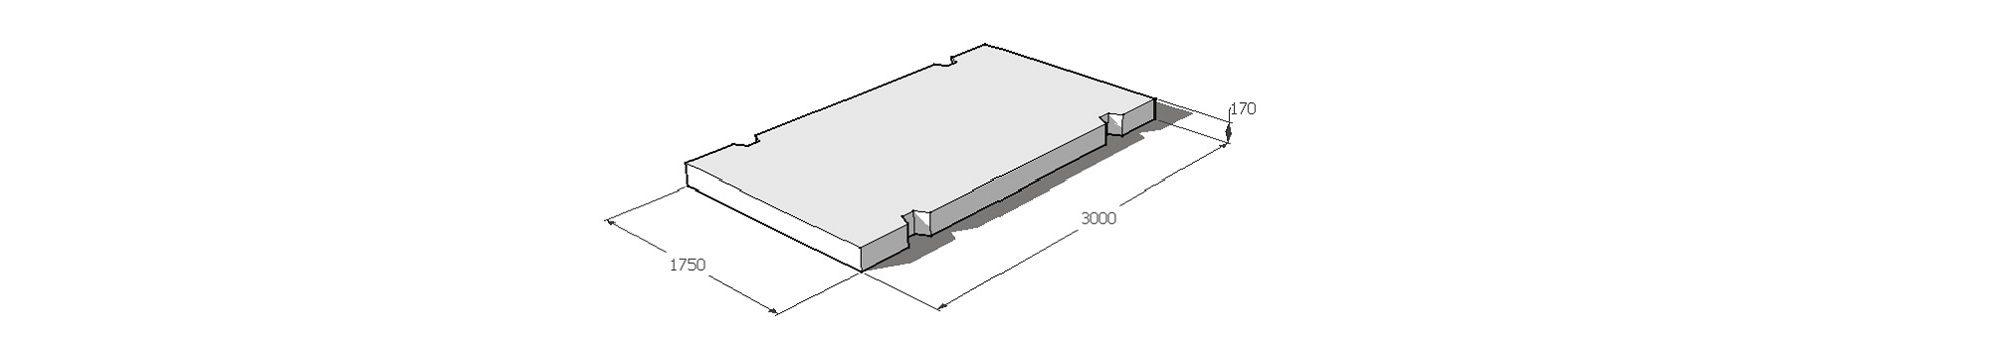 Дорожная плита железобетонная. Габариты 3,0м х 1,75 м